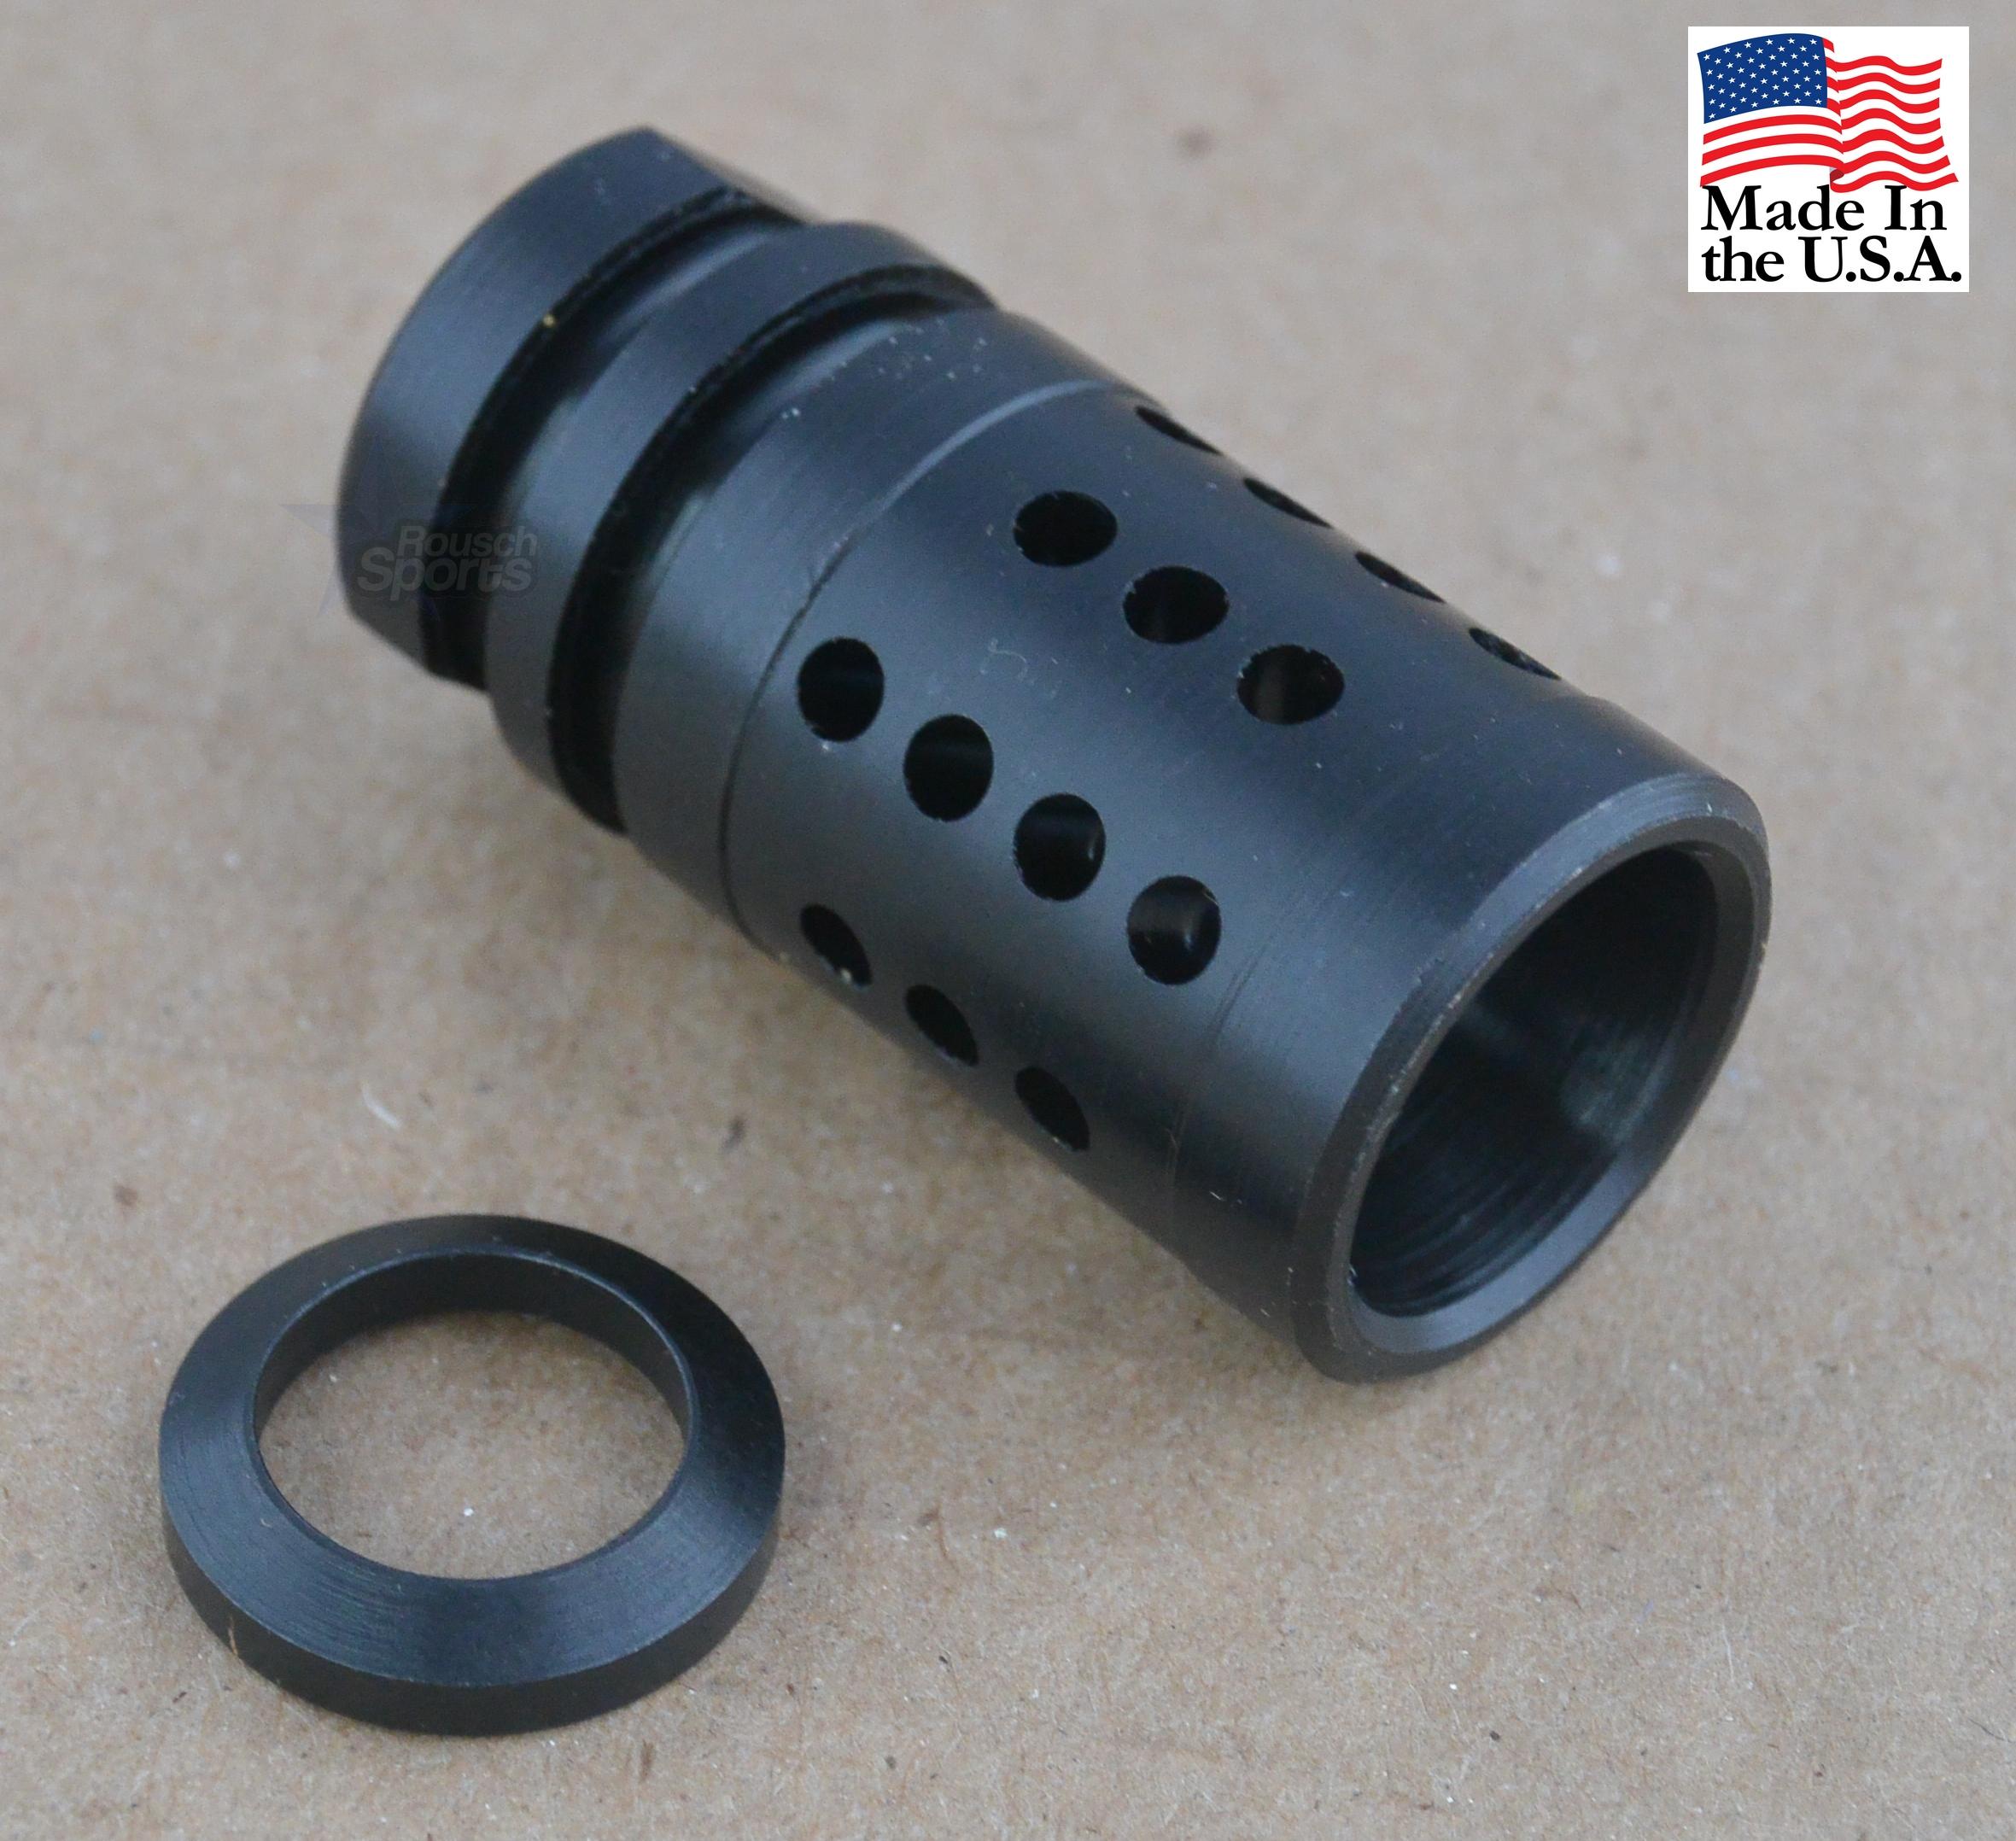 "A2 Fox Hole V1 Flash Hider Muzzle Device Half Cage 1/2""-28 5/8""-24 Best Wholesale Discount Prices AR15 M16 M4 Austin Texas USA"